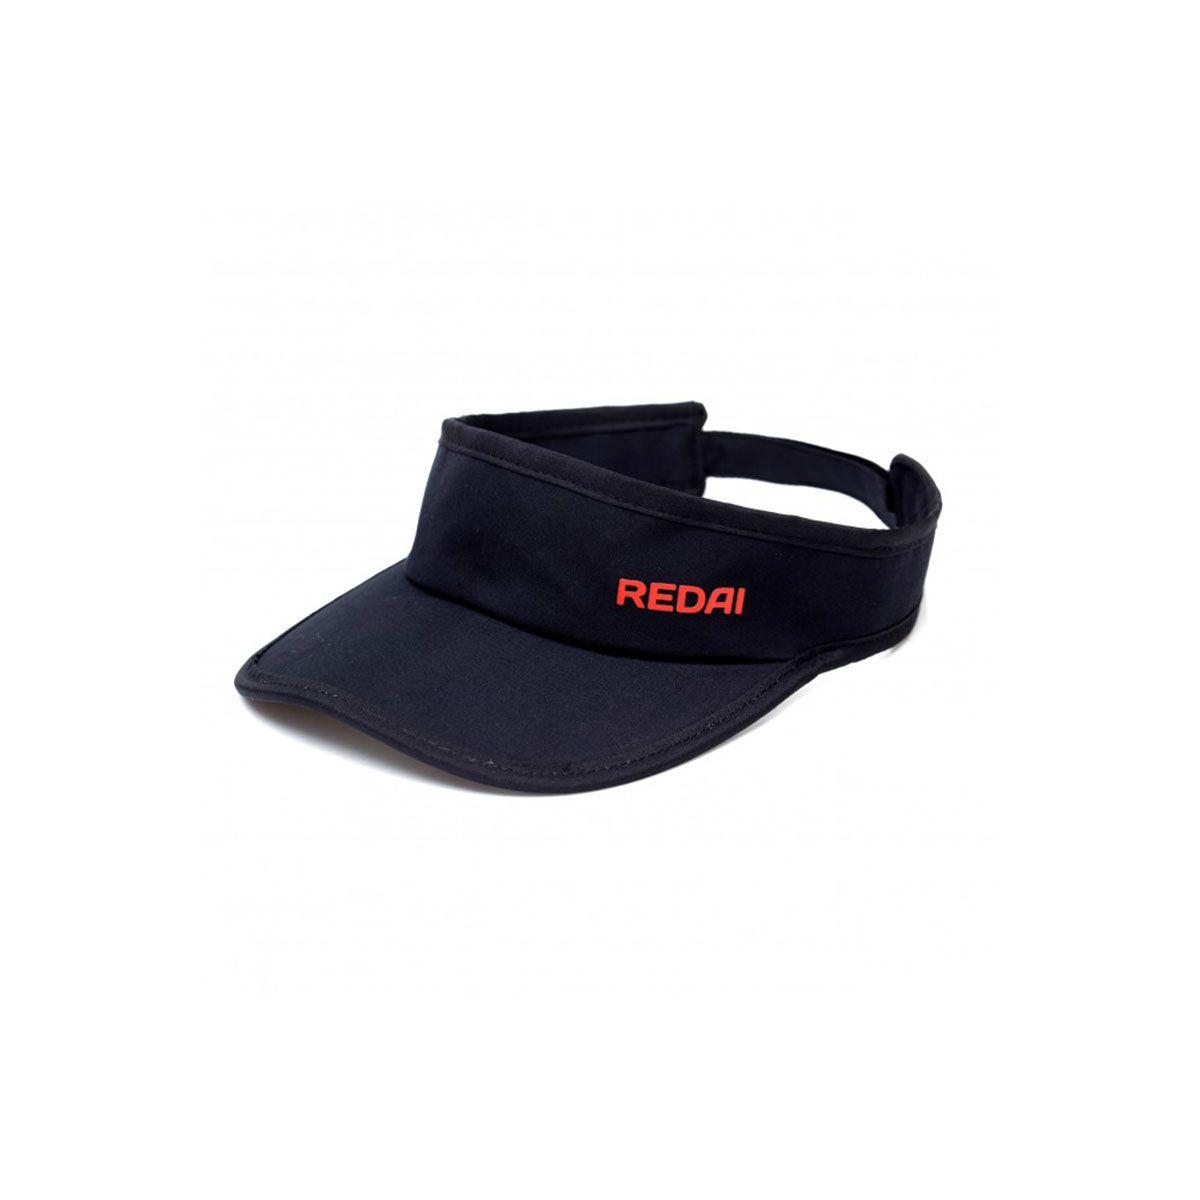 Visor - Redai Brand - Black